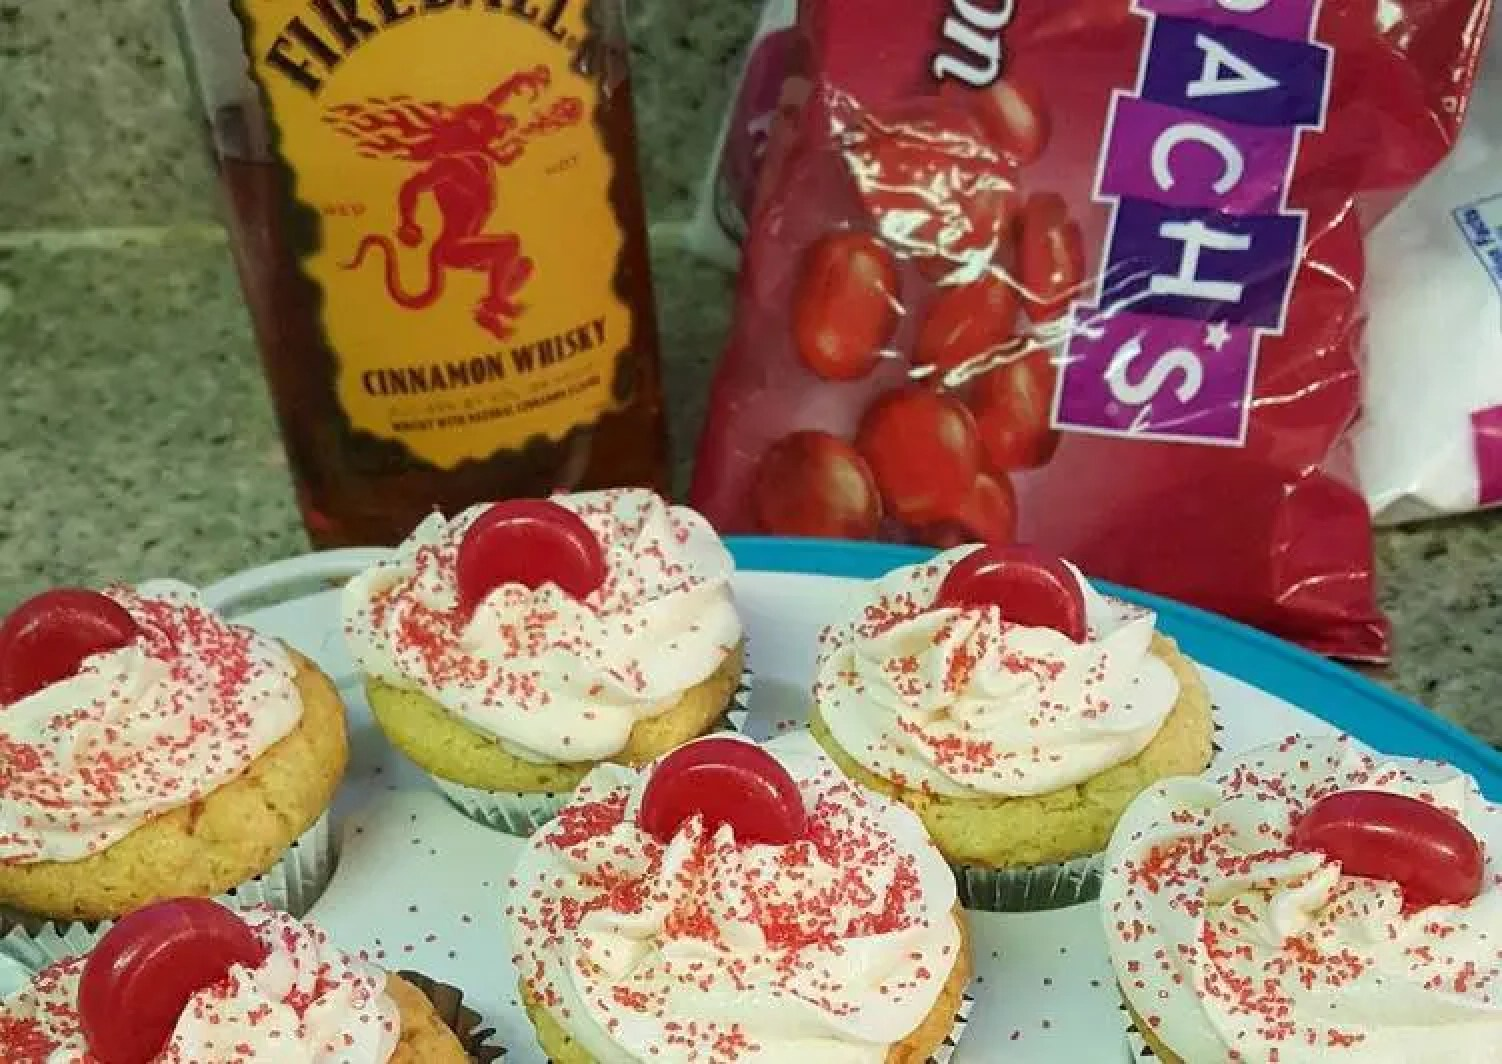 Fireball whiskey cupcakes